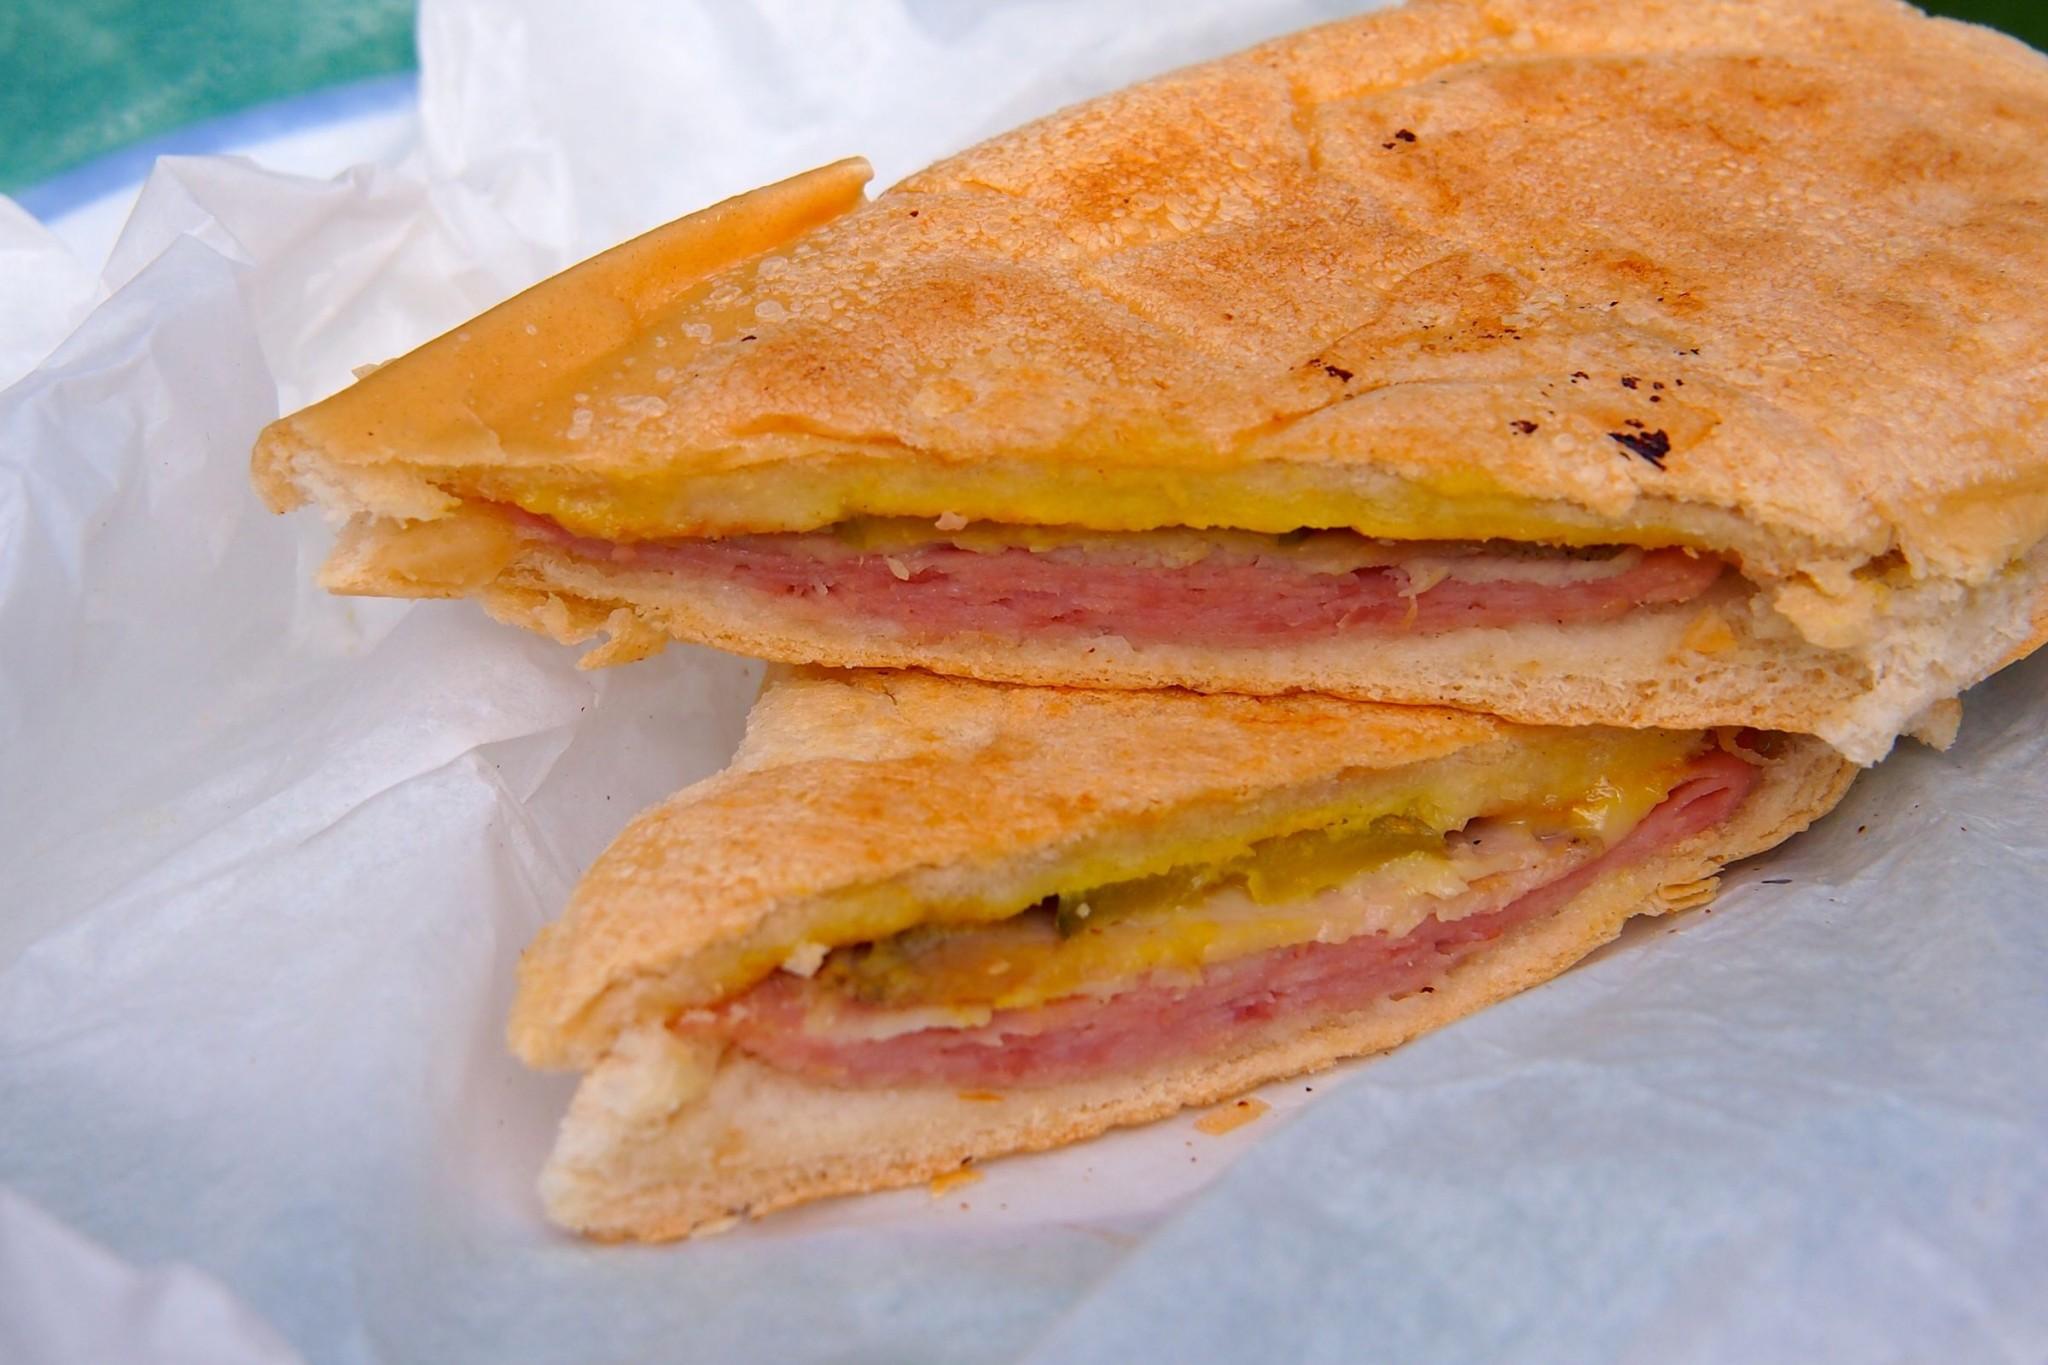 El Cubano, The Hearty Sandwich Born of Tobacco: Taste of the Caribbean